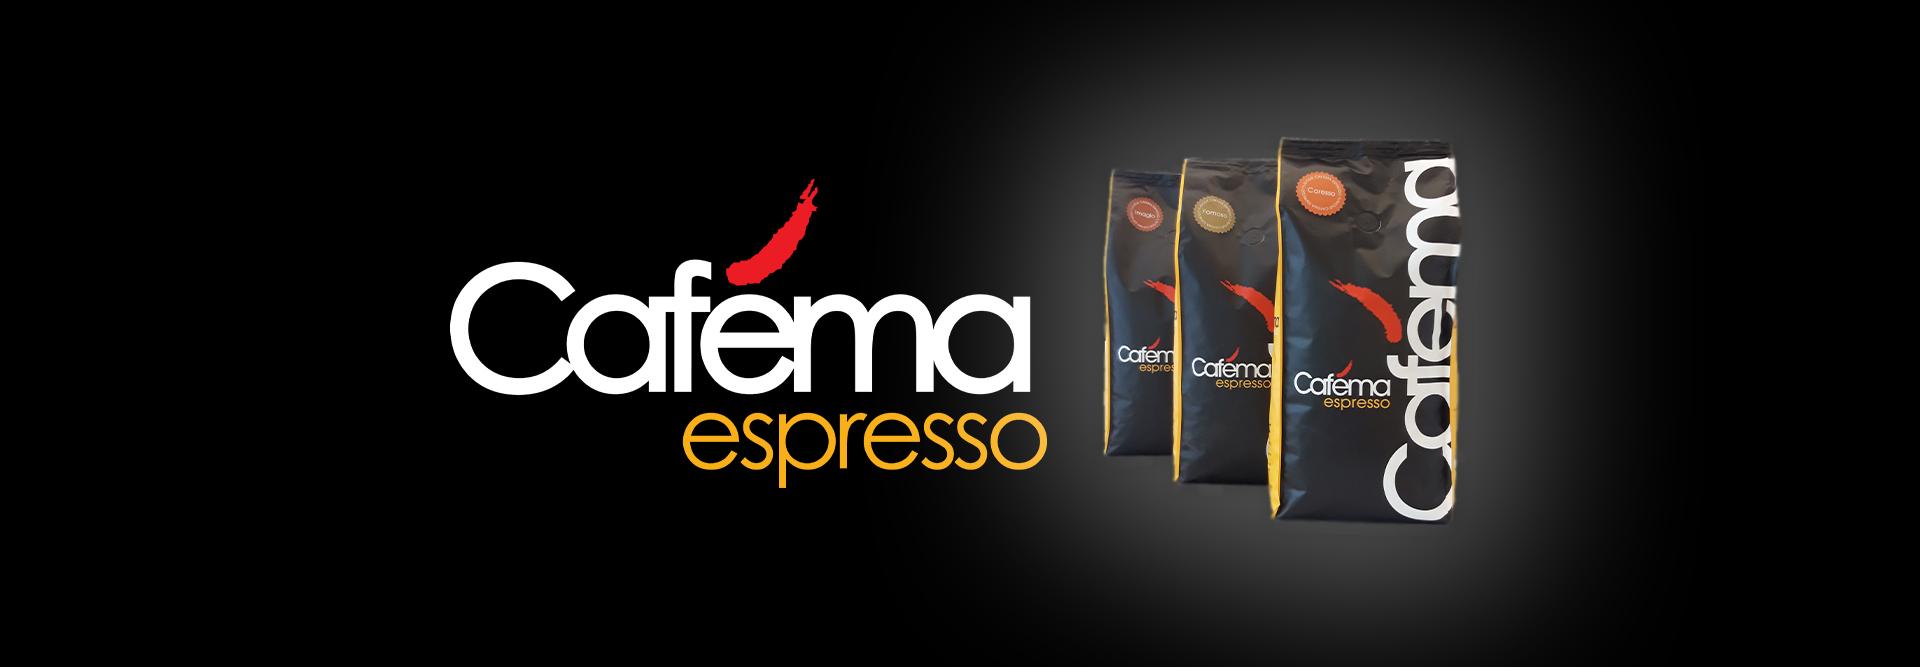 Hero image Cafema espresso.jpg